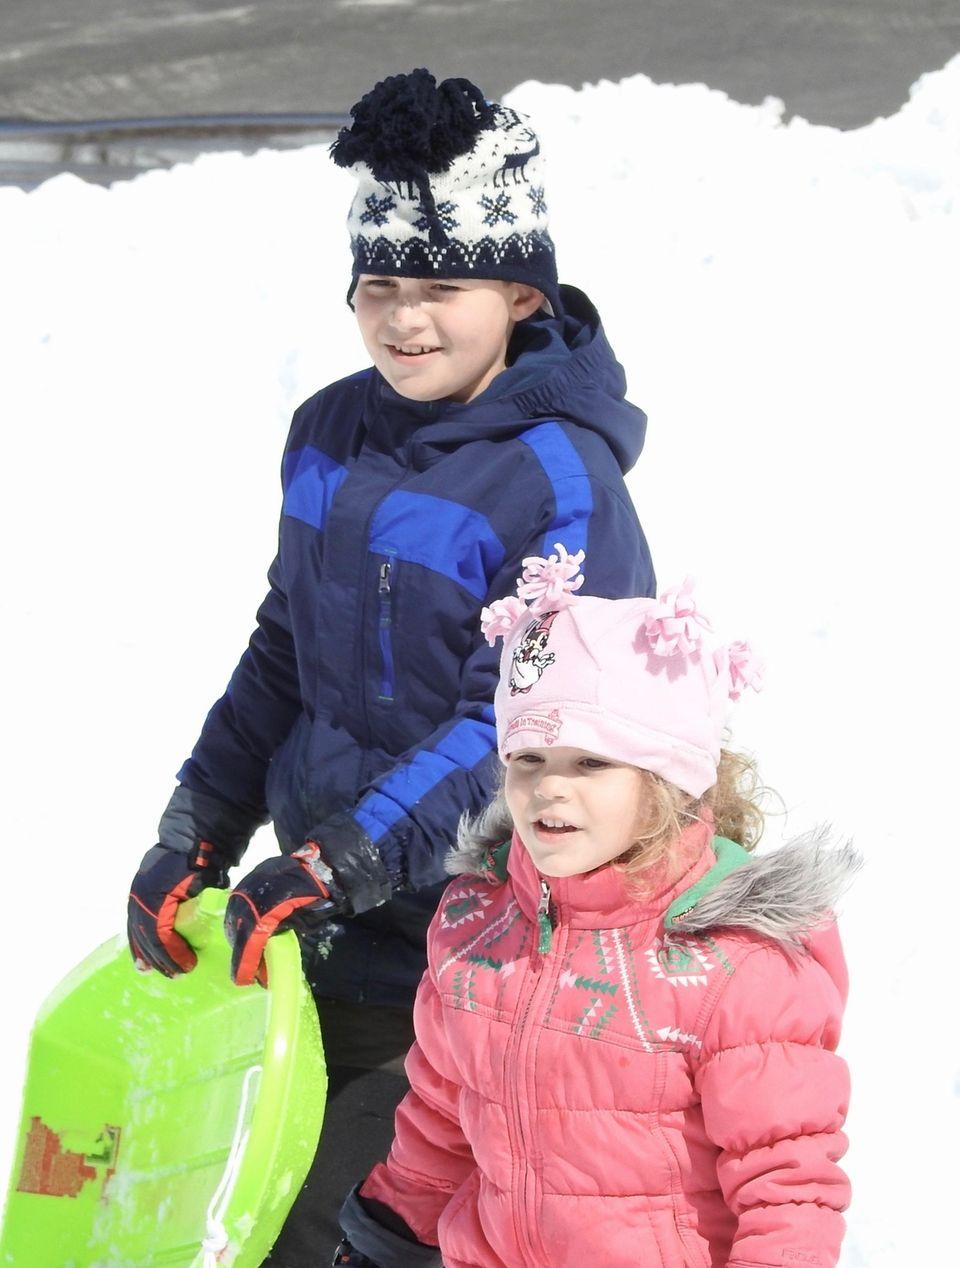 Rayan & Lauren enjoying playing in the snow.